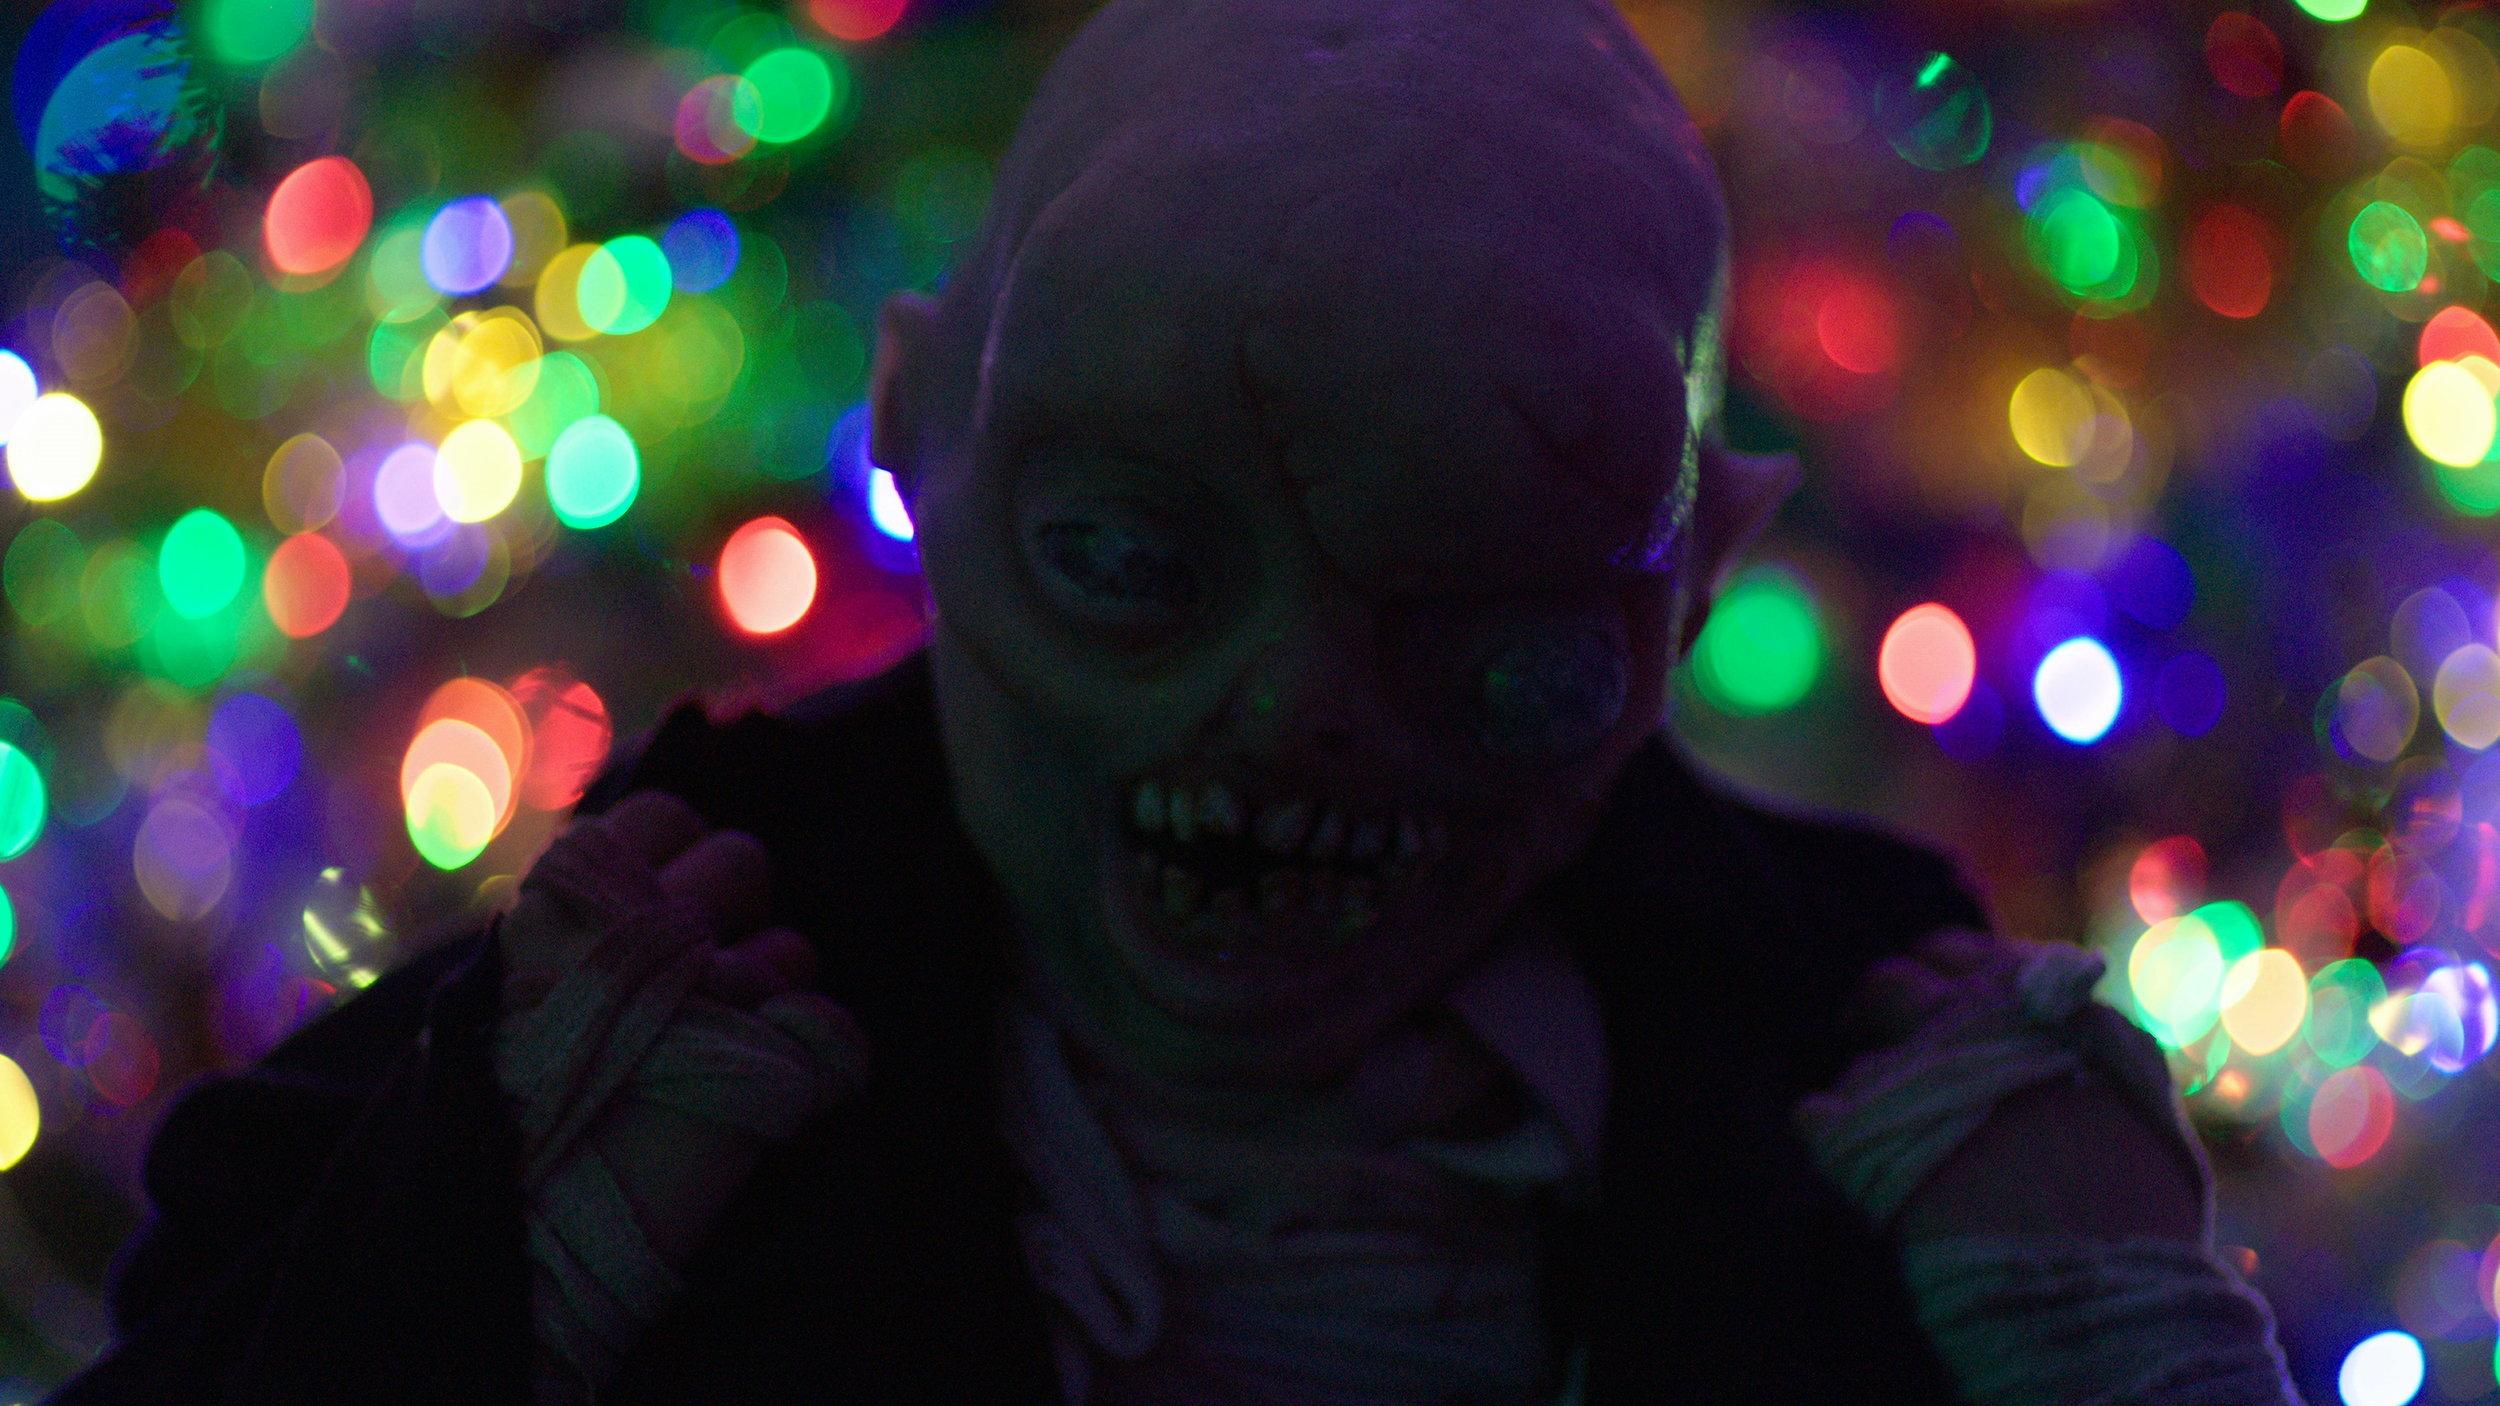 Cletus Revealed CU - Red Christmas Photo by Douglas Burdorff.jpeg